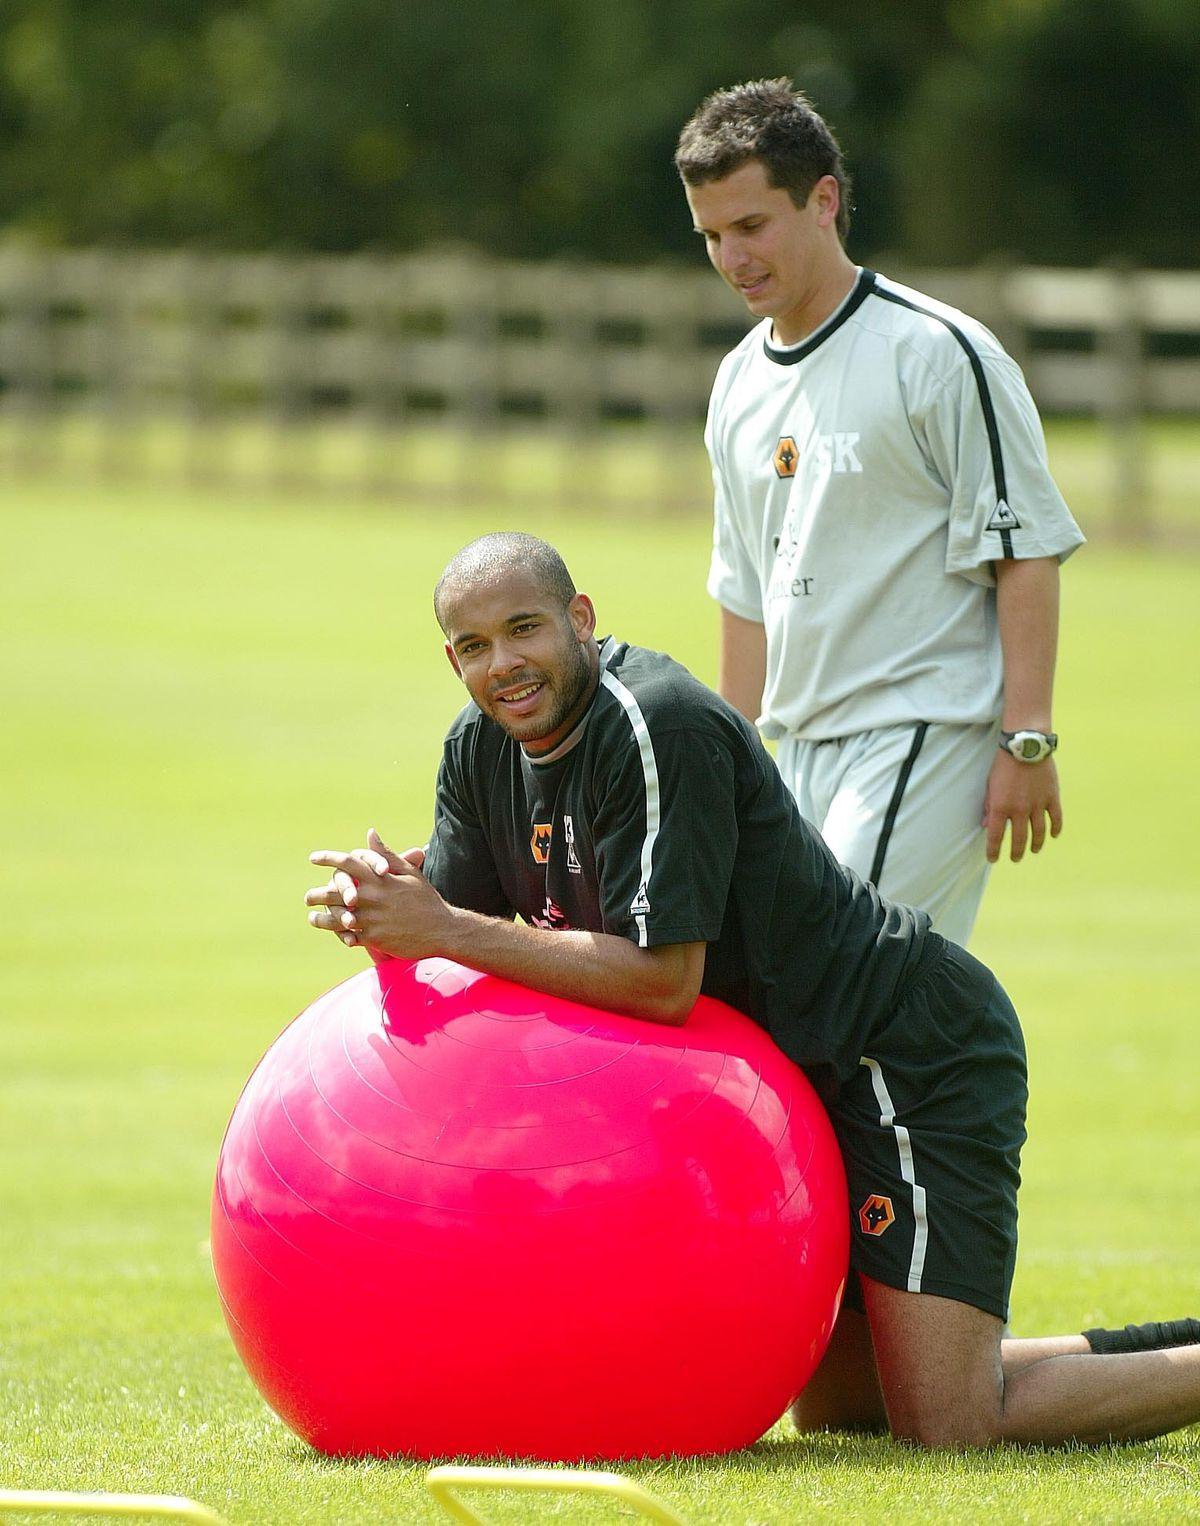 Matt Murray and assistant physiotherapist Steve Kemp